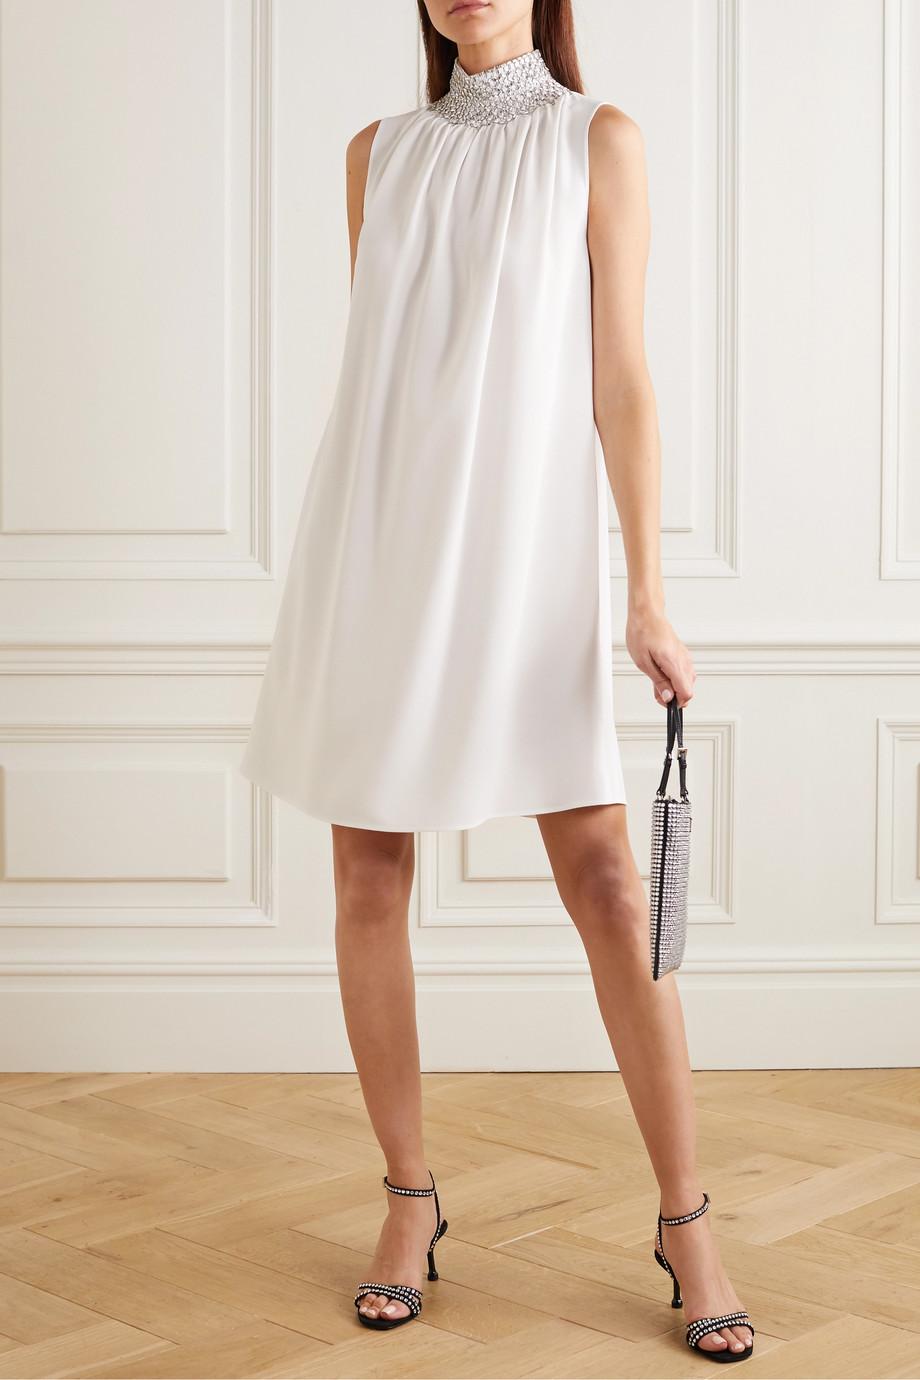 Prada Mini-robe en cady à perles